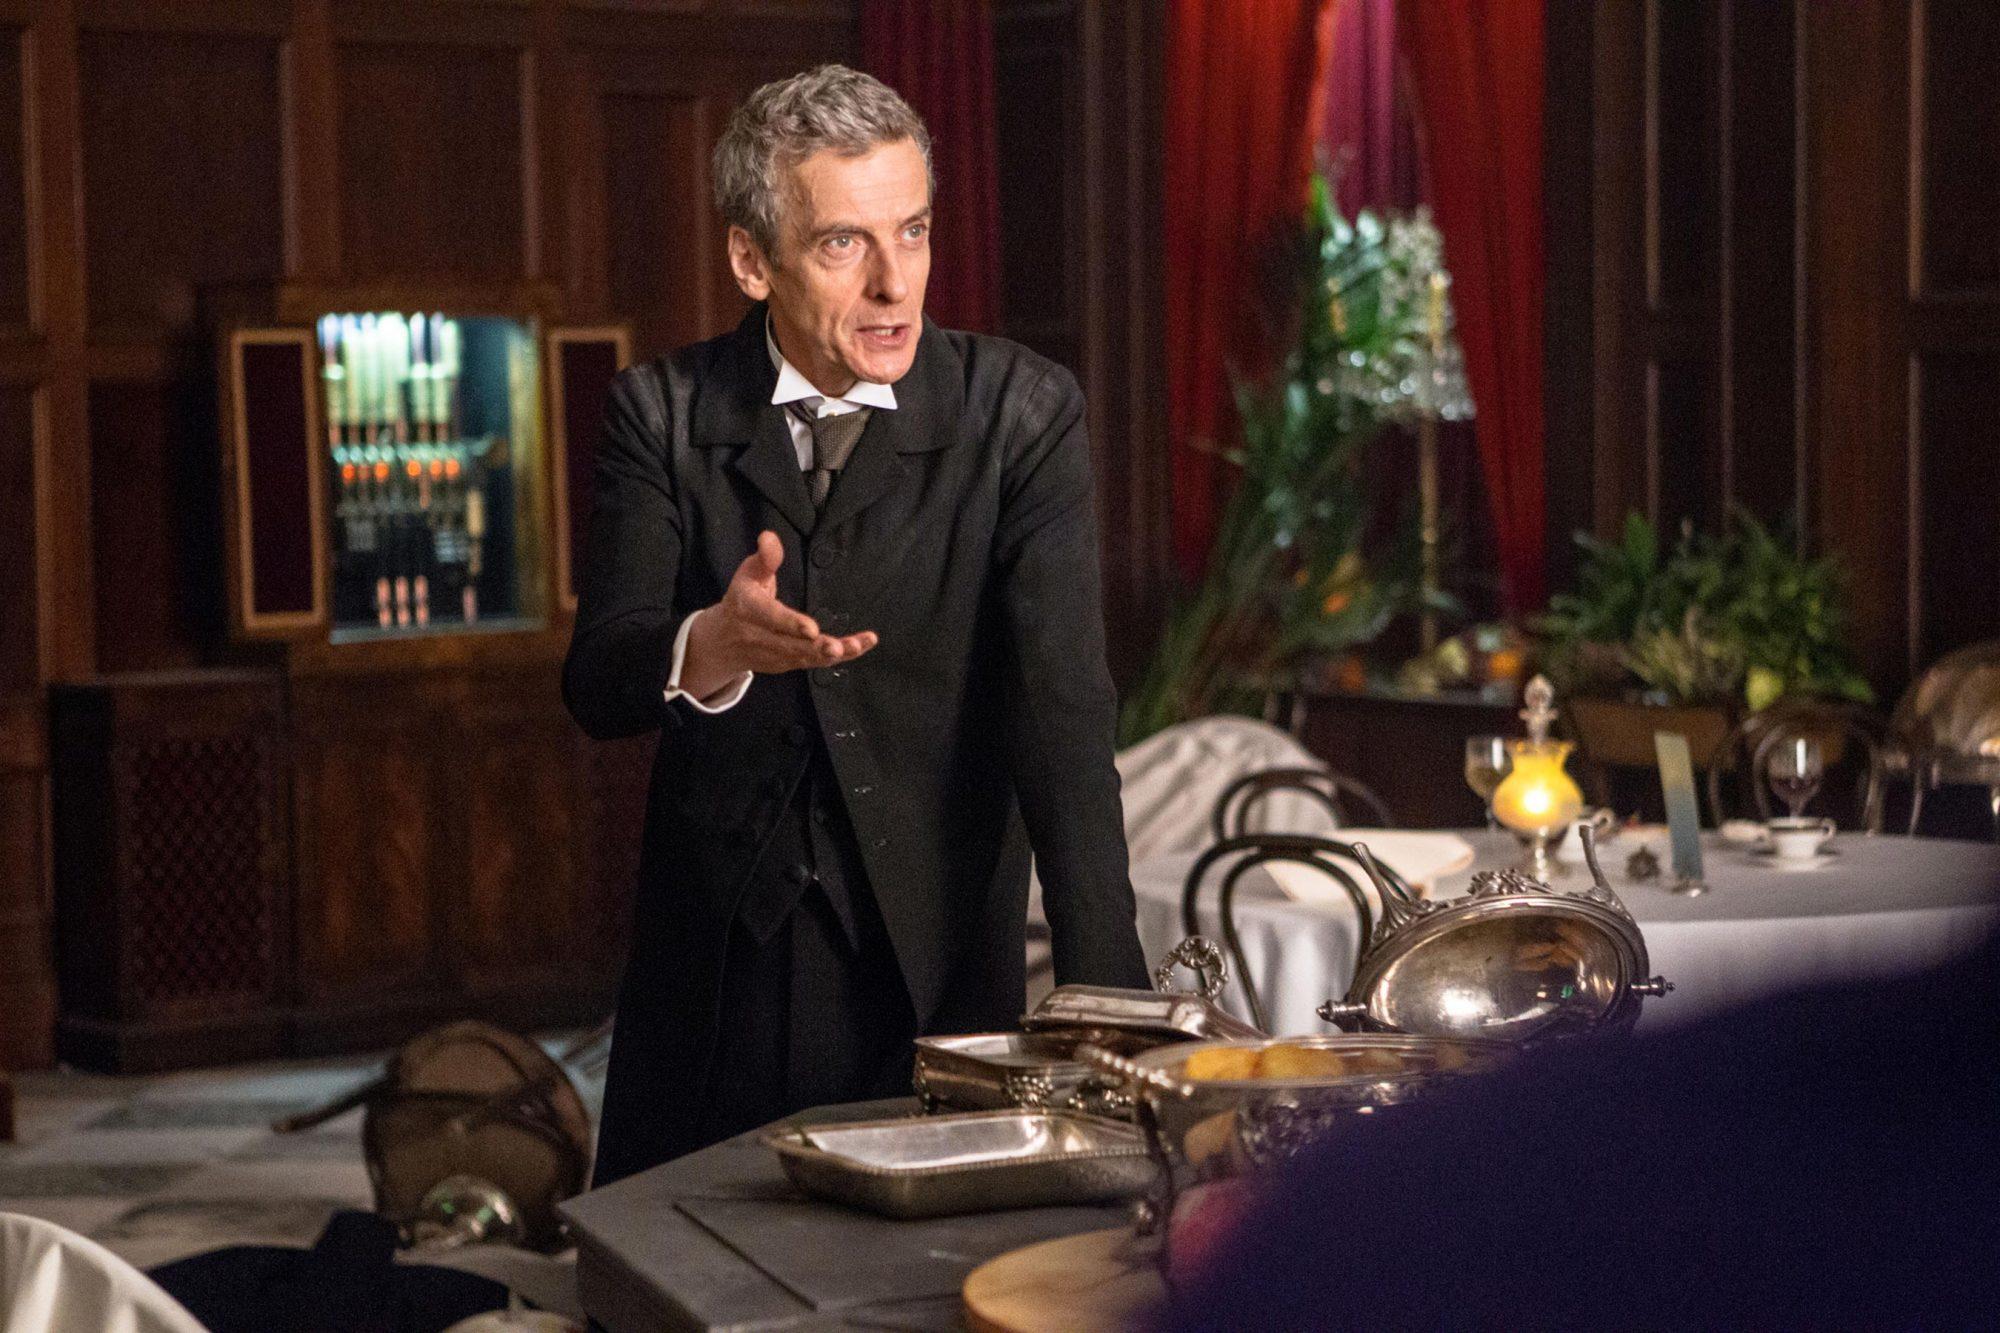 DOCTOR WHO, Peter Capaldi, 'Deep Breath', (Season 8, ep. 801, aired Aug. 23, 2014). photo: ©BBC /